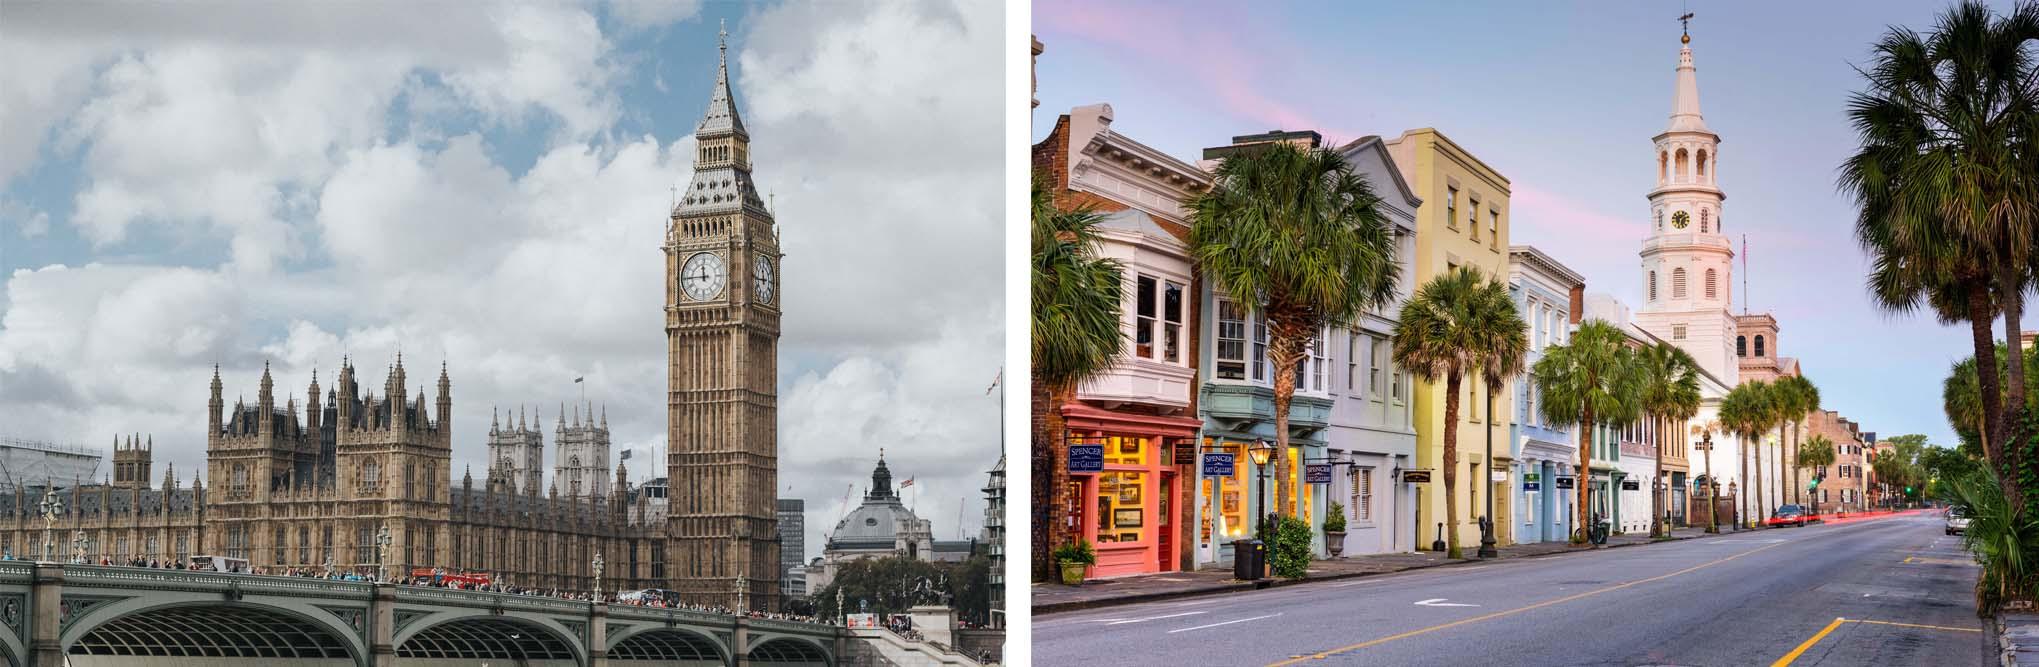 London and Charleston Collage